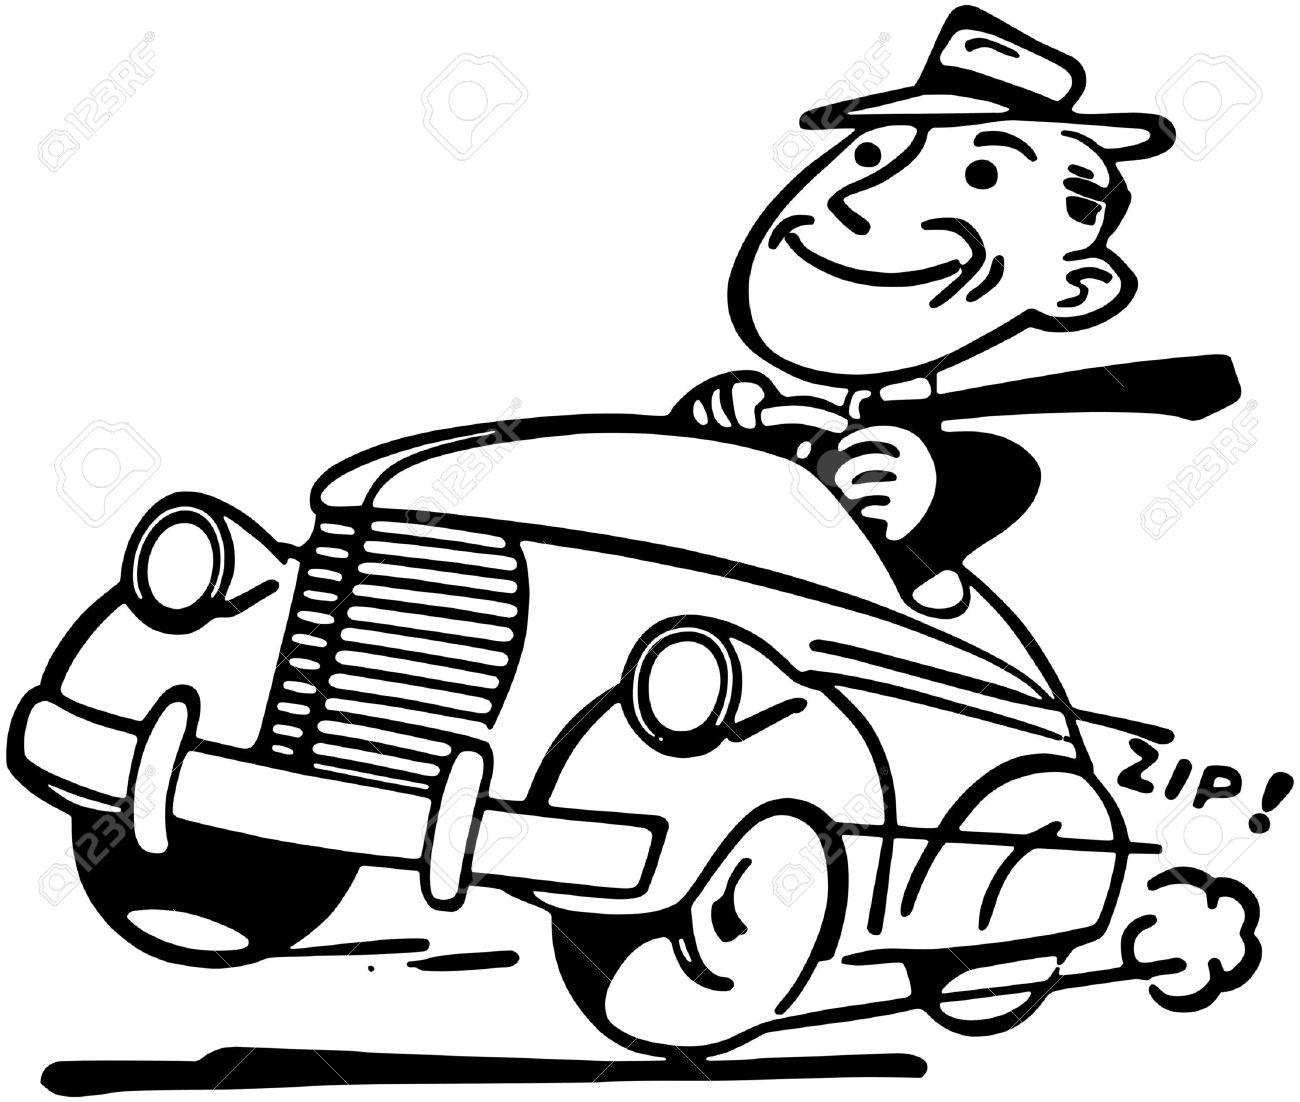 Happy Motorist Royalty Free Cliparts, Vectors, And Stock.